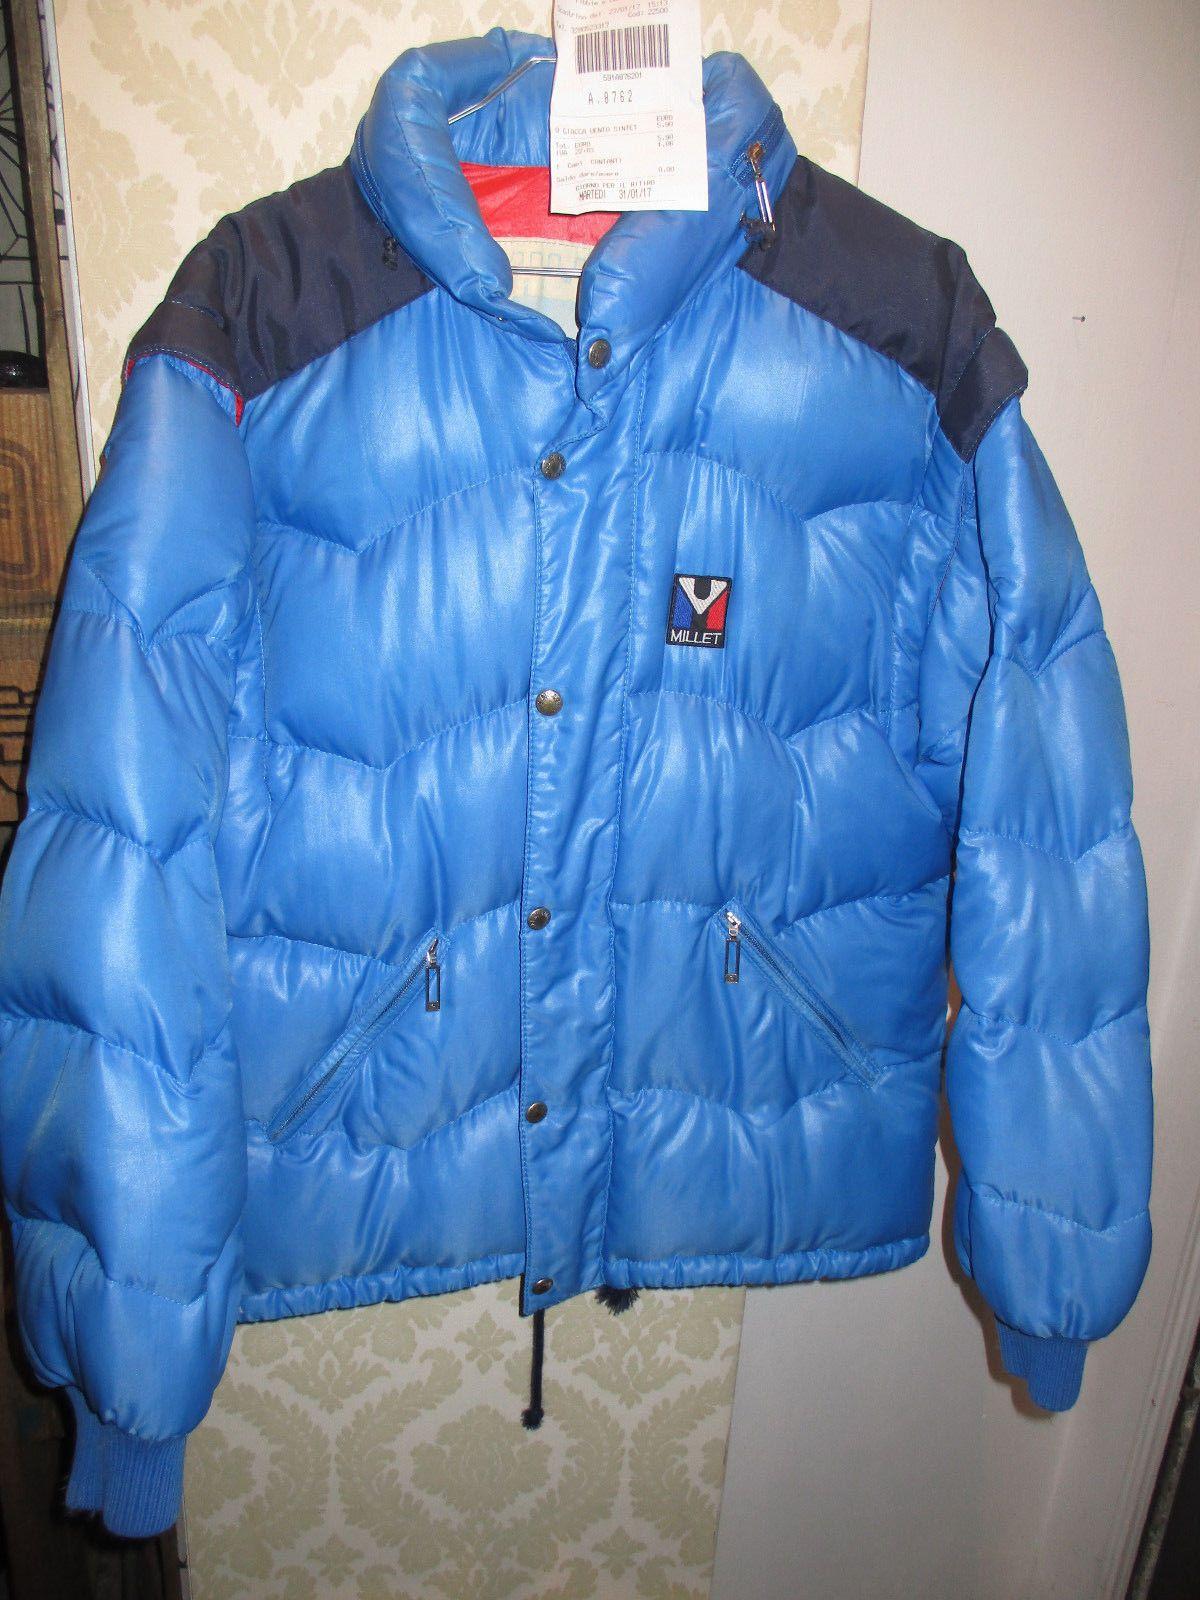 piumino MILLET*3(L)*PIUMA D'OCA* PANINARO* VINTAGE 80'S*GOOSEDOWN*vest/smanicato | eBay